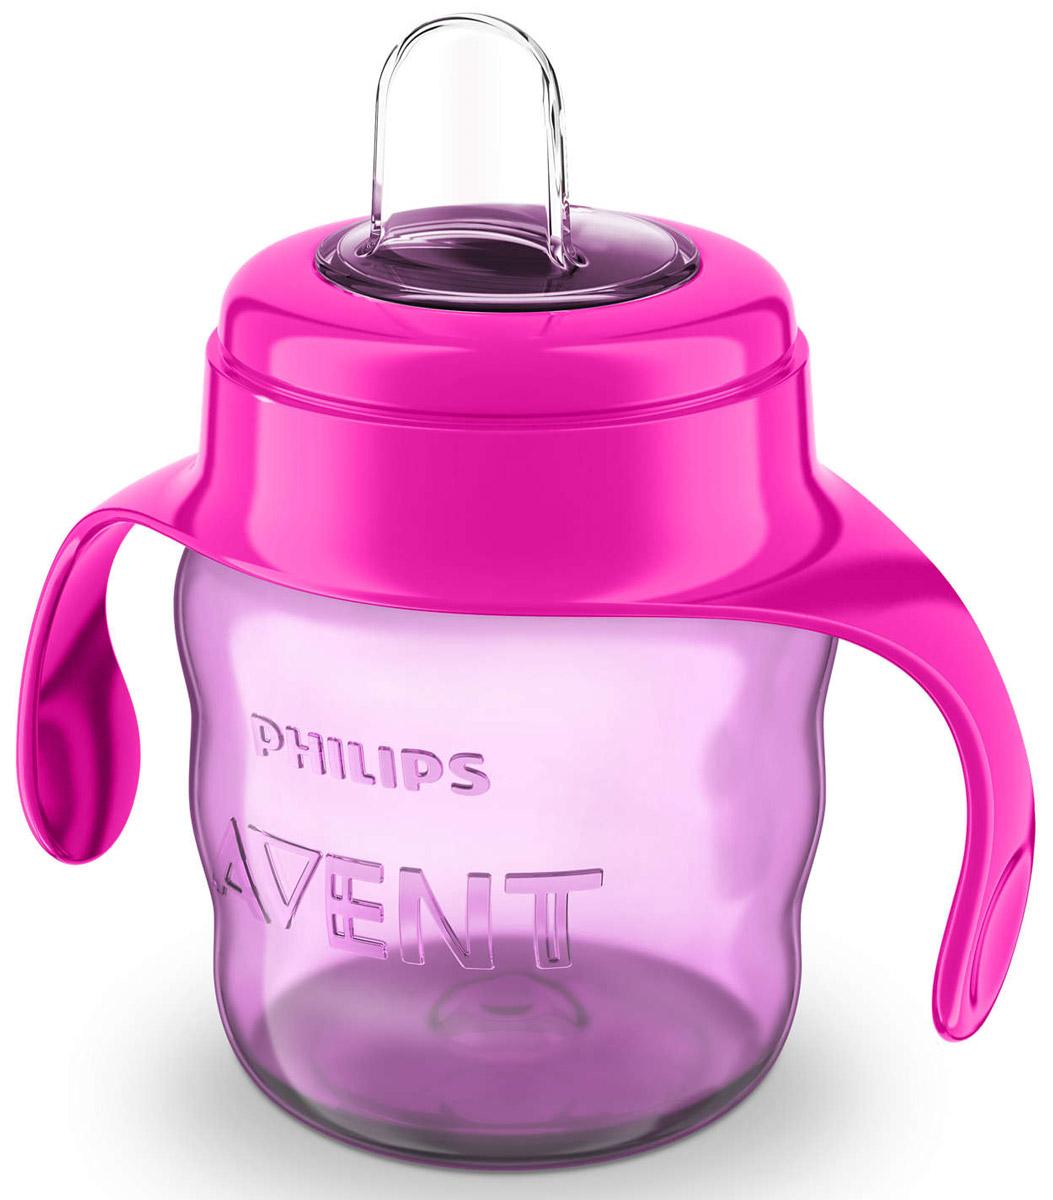 Philips Avent Чашка-поильник Comfort от 6 месяцев цвет фиолетовый фуксия 200 мл SCF551/00 philips avent чашка поильник 260 мл 12м красный scf782 00